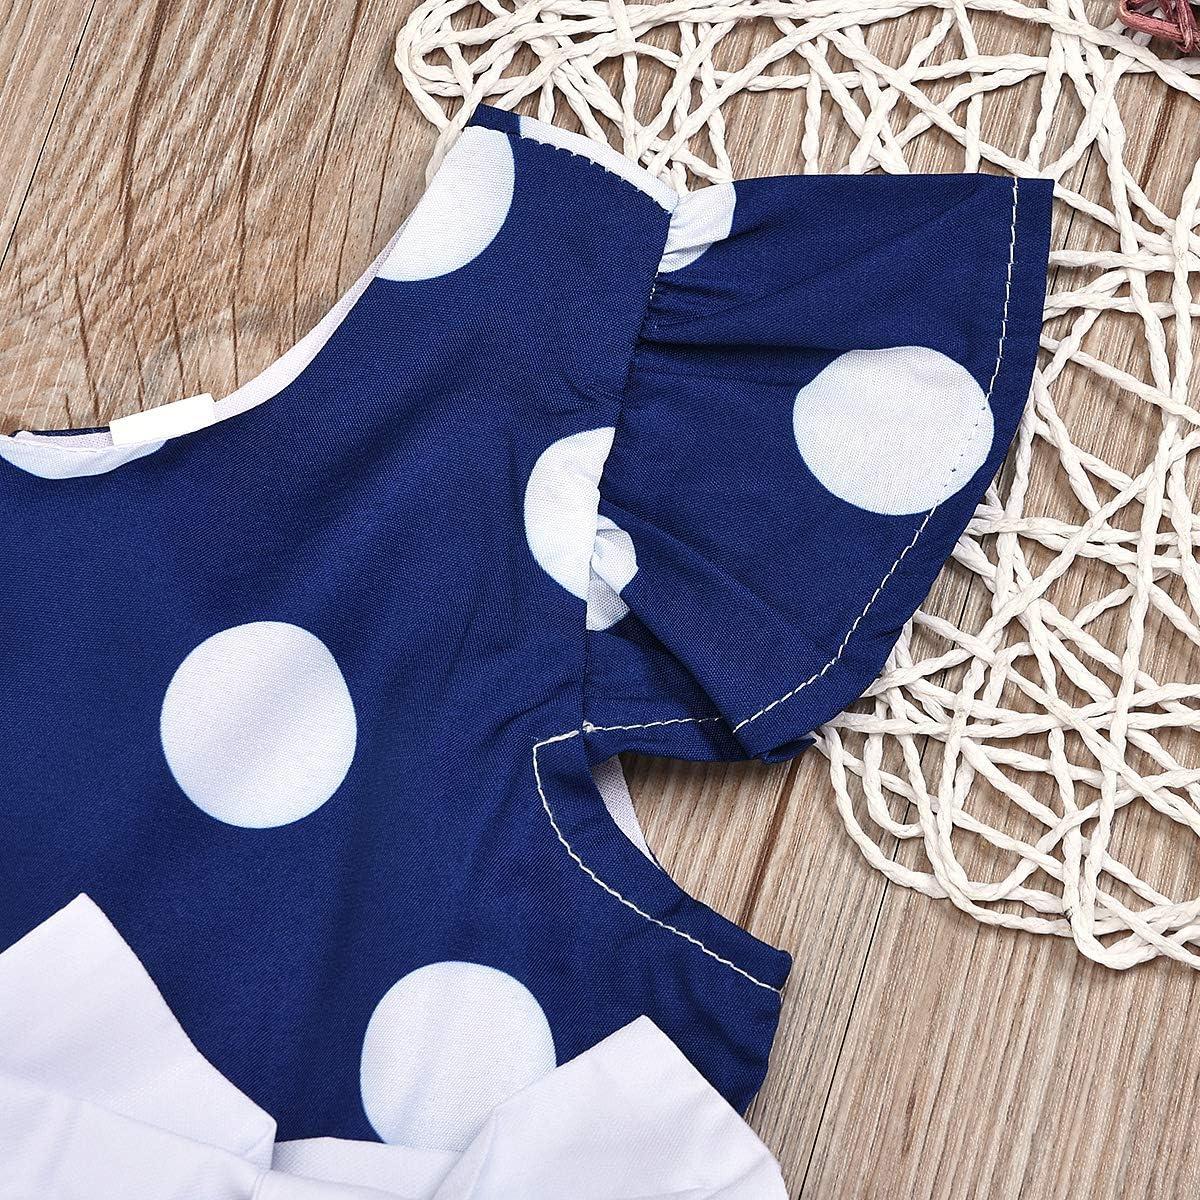 Haokaini Kids Baby Girls Blue Polka Dot Bowknot Party Dress for Infant Toddler